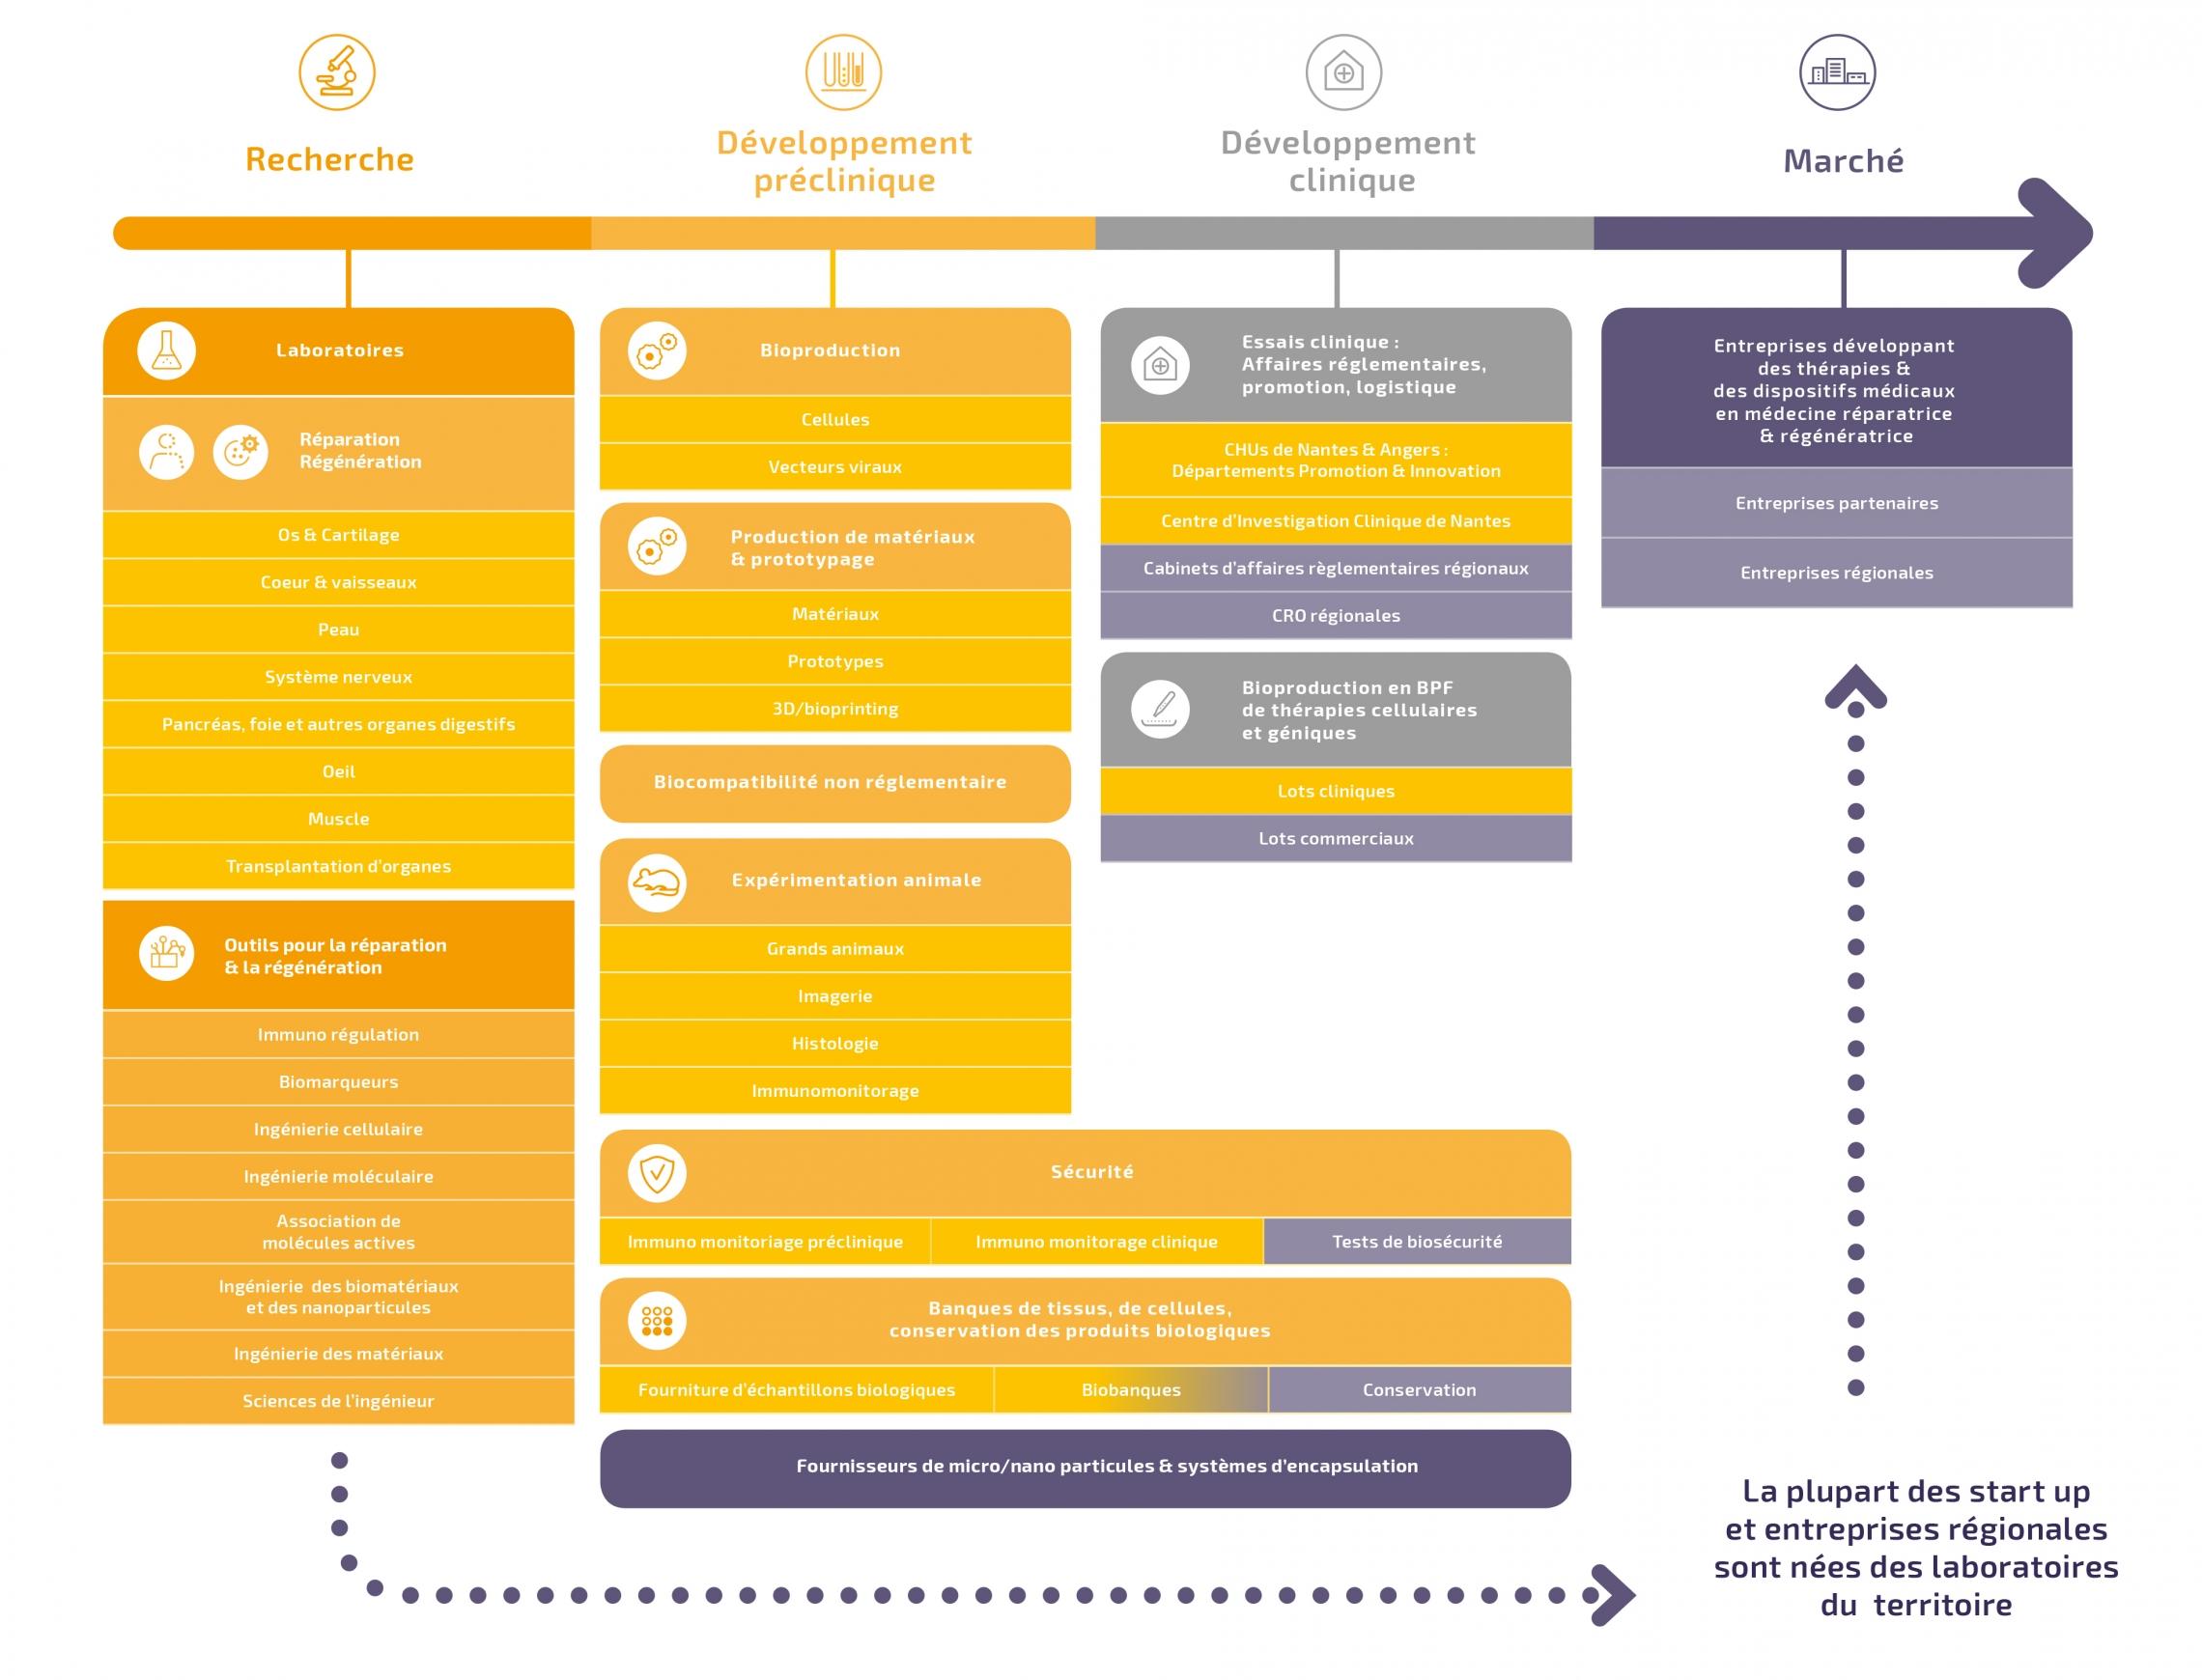 Panorama-des-competences